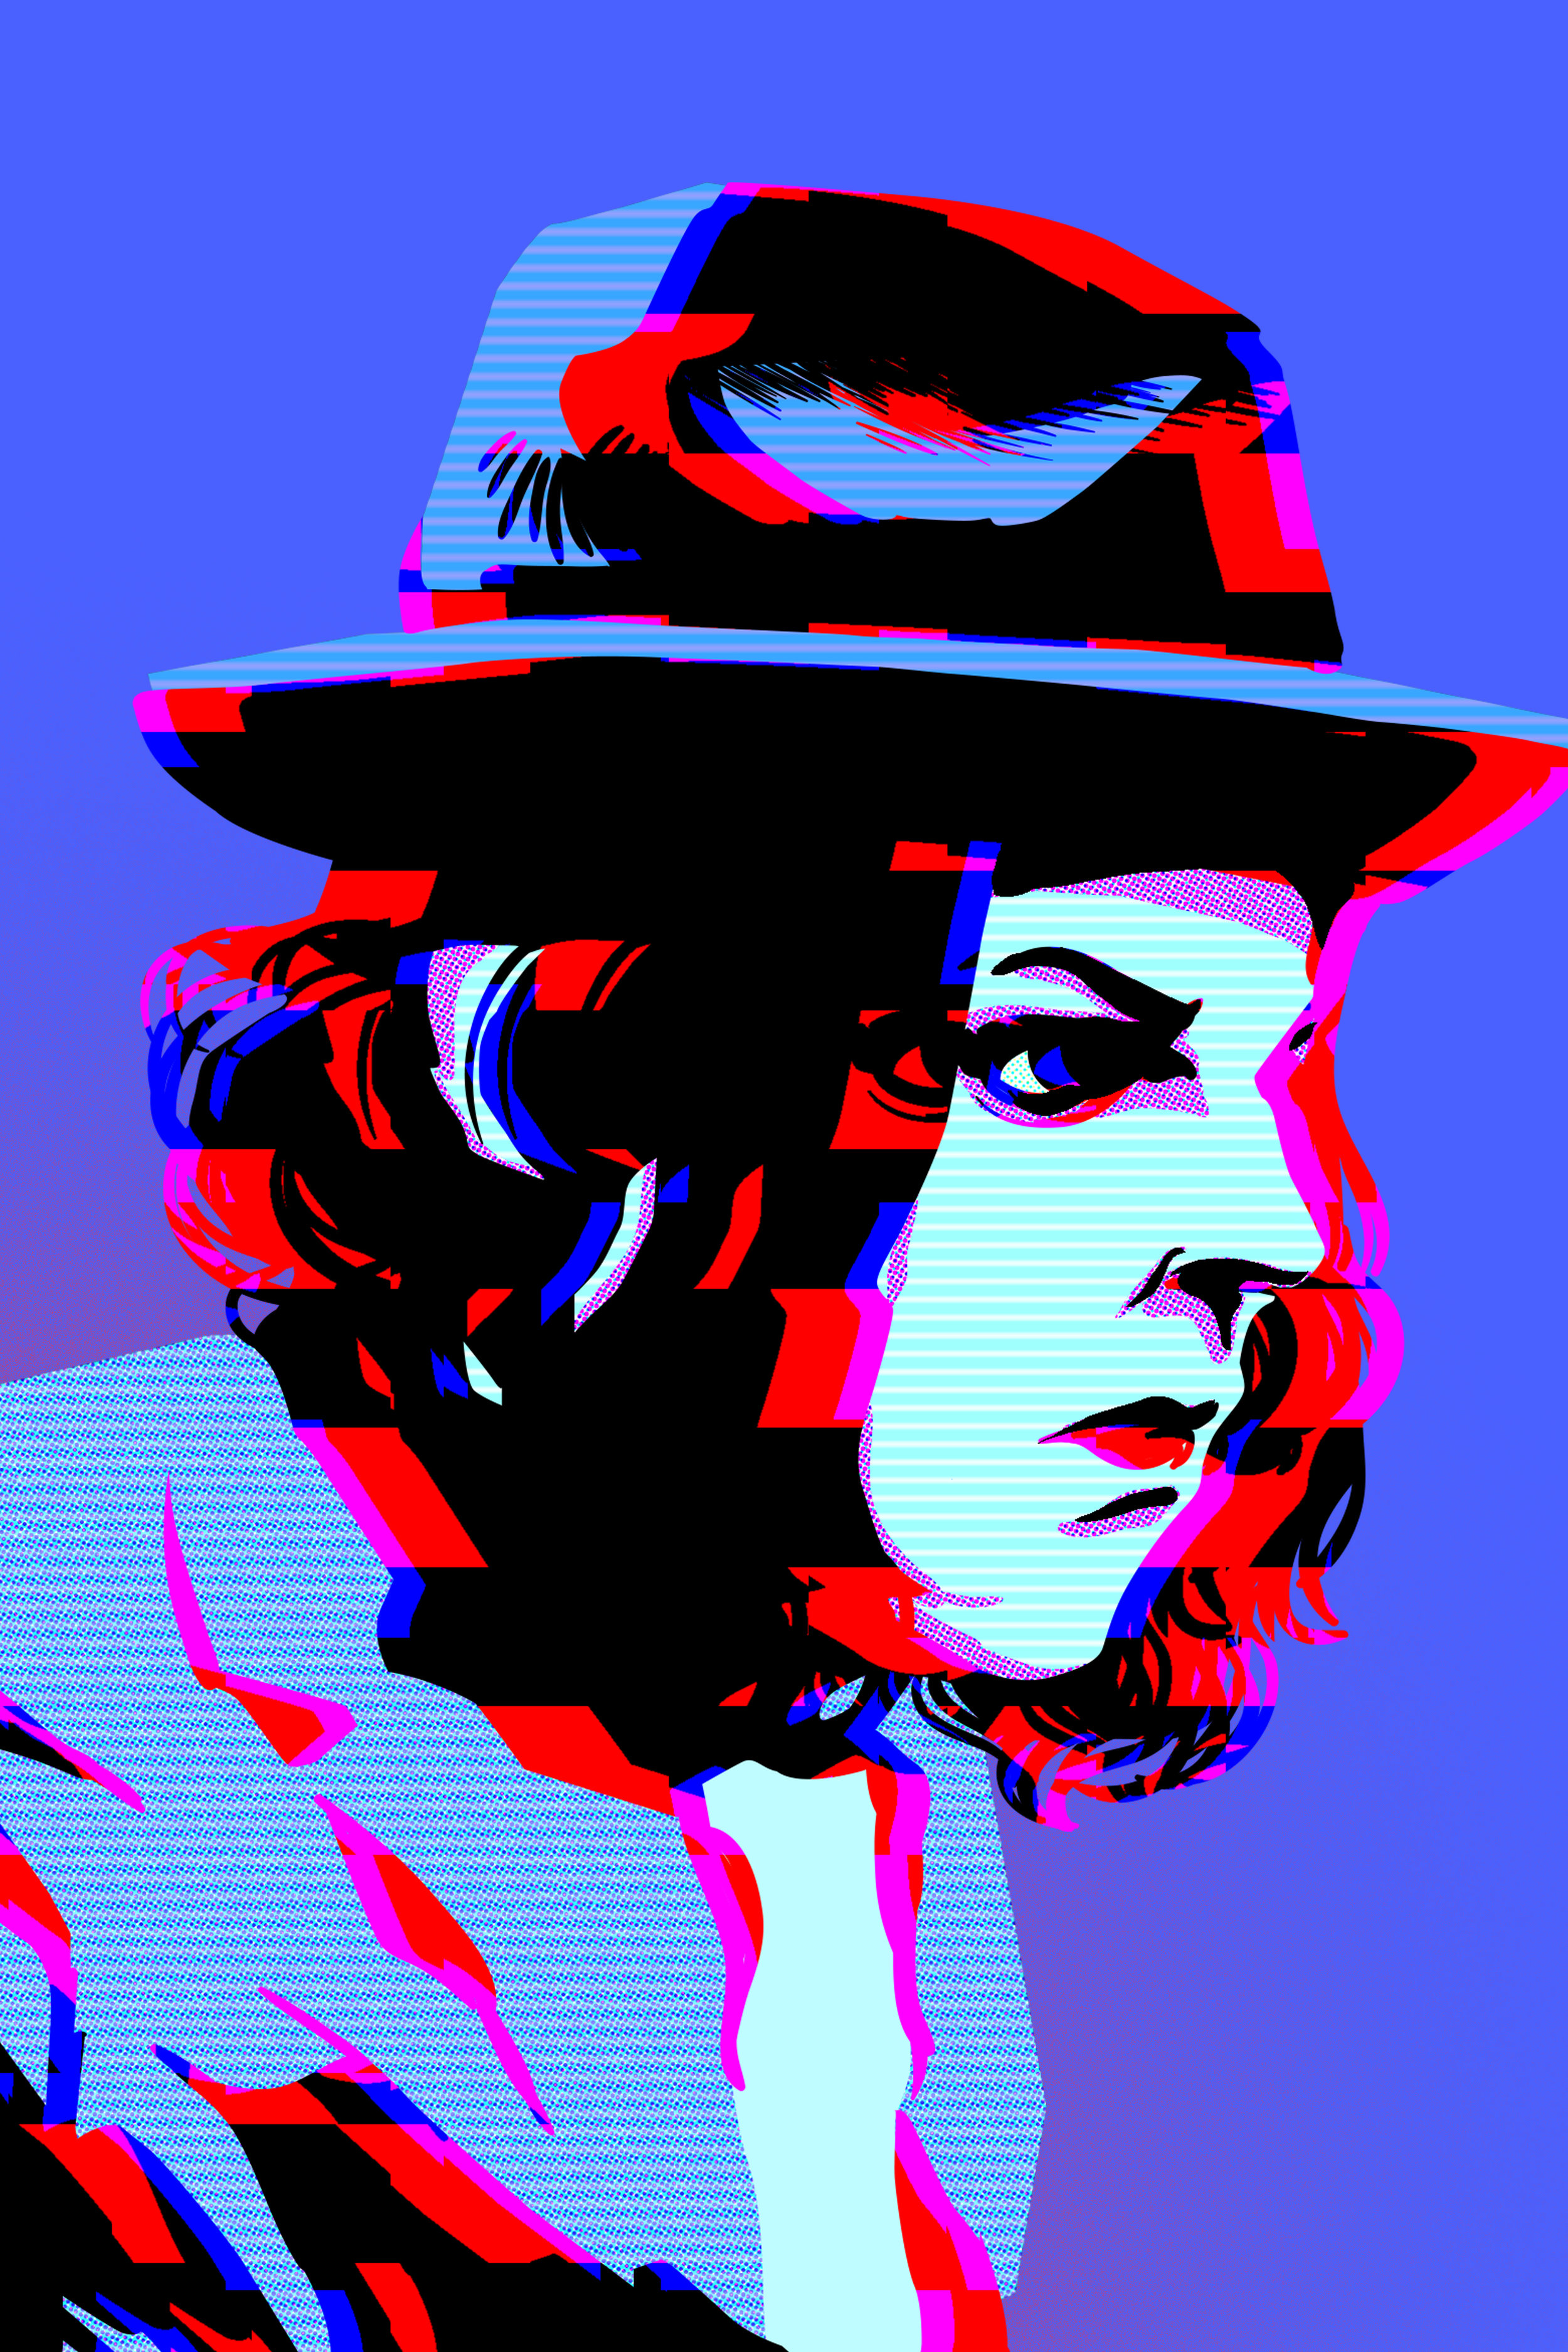 jack_white_portrait_red.jpg